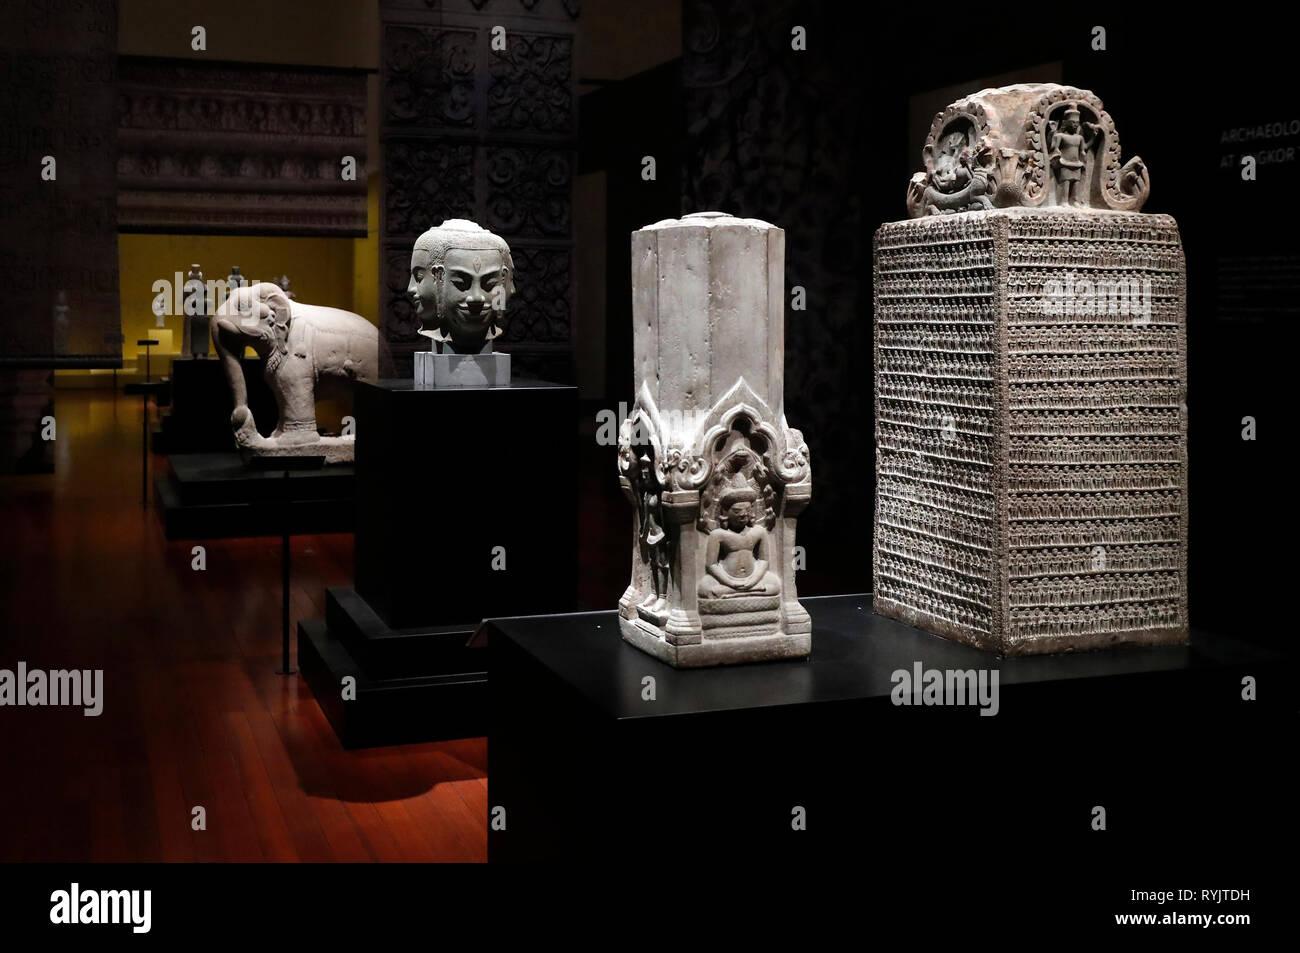 Asian Civilisations Museum.  Singapore. - Stock Image